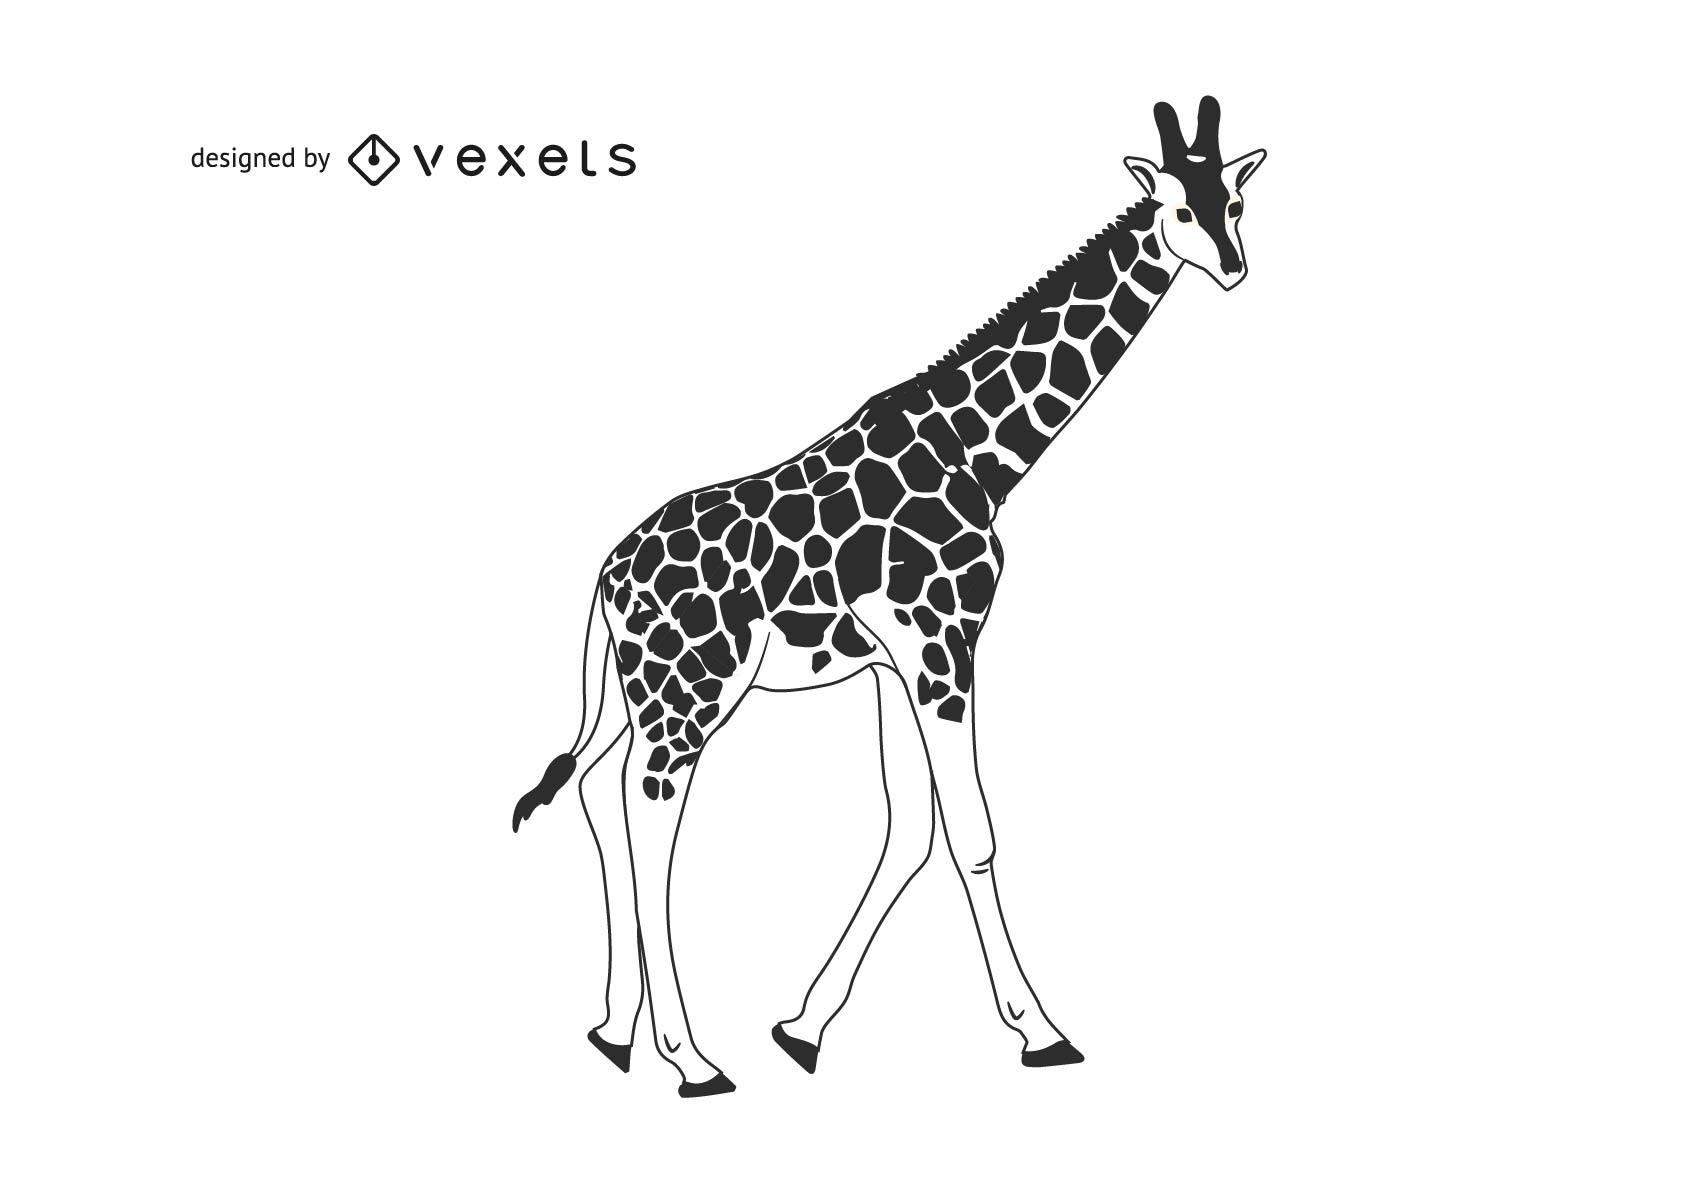 Girafa preto e branco com estampa detalhada do corpo